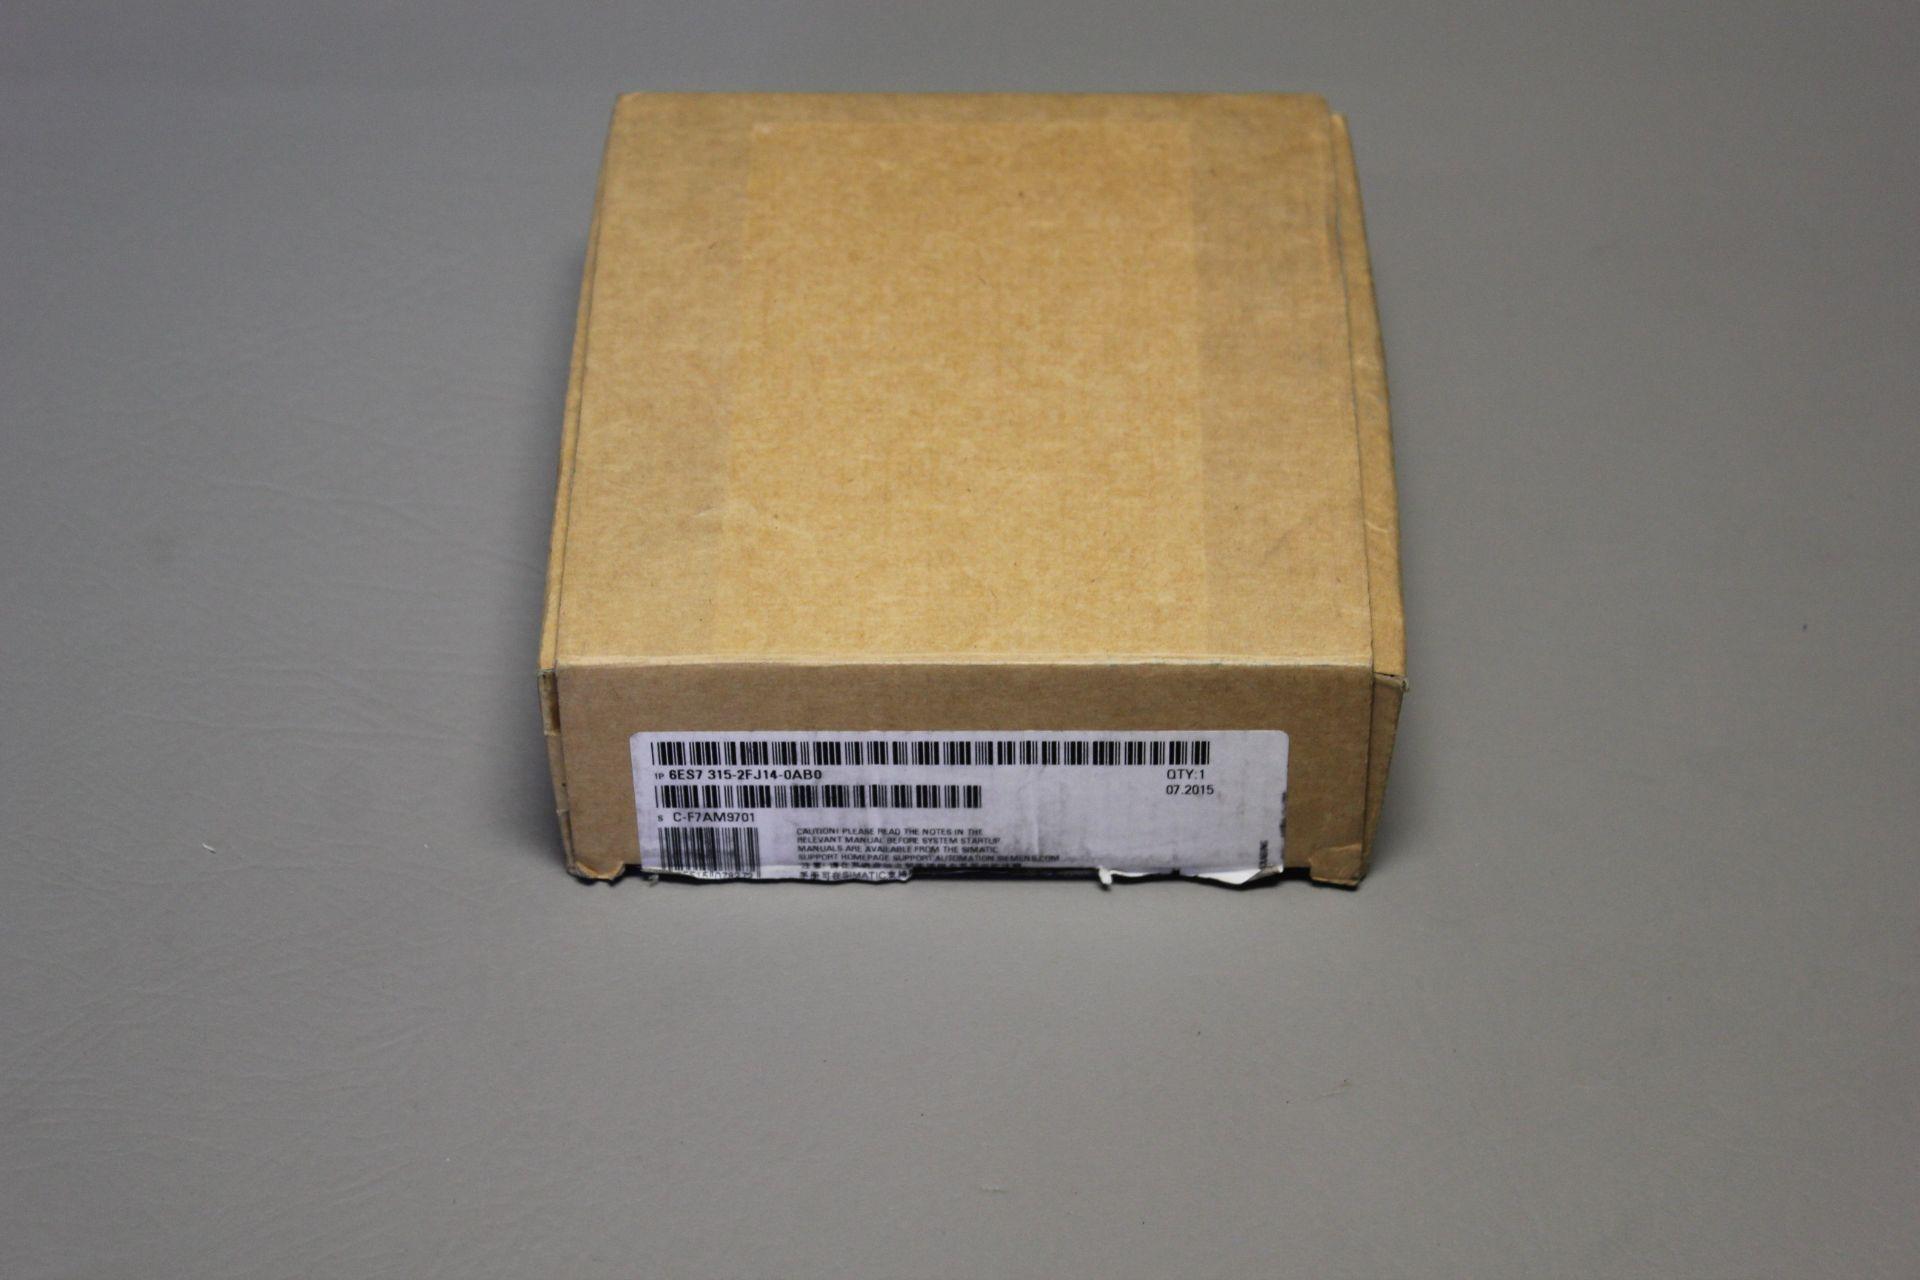 NEW SIEMENS SIMATIC S7-300 PLC CPU PROCESSOR